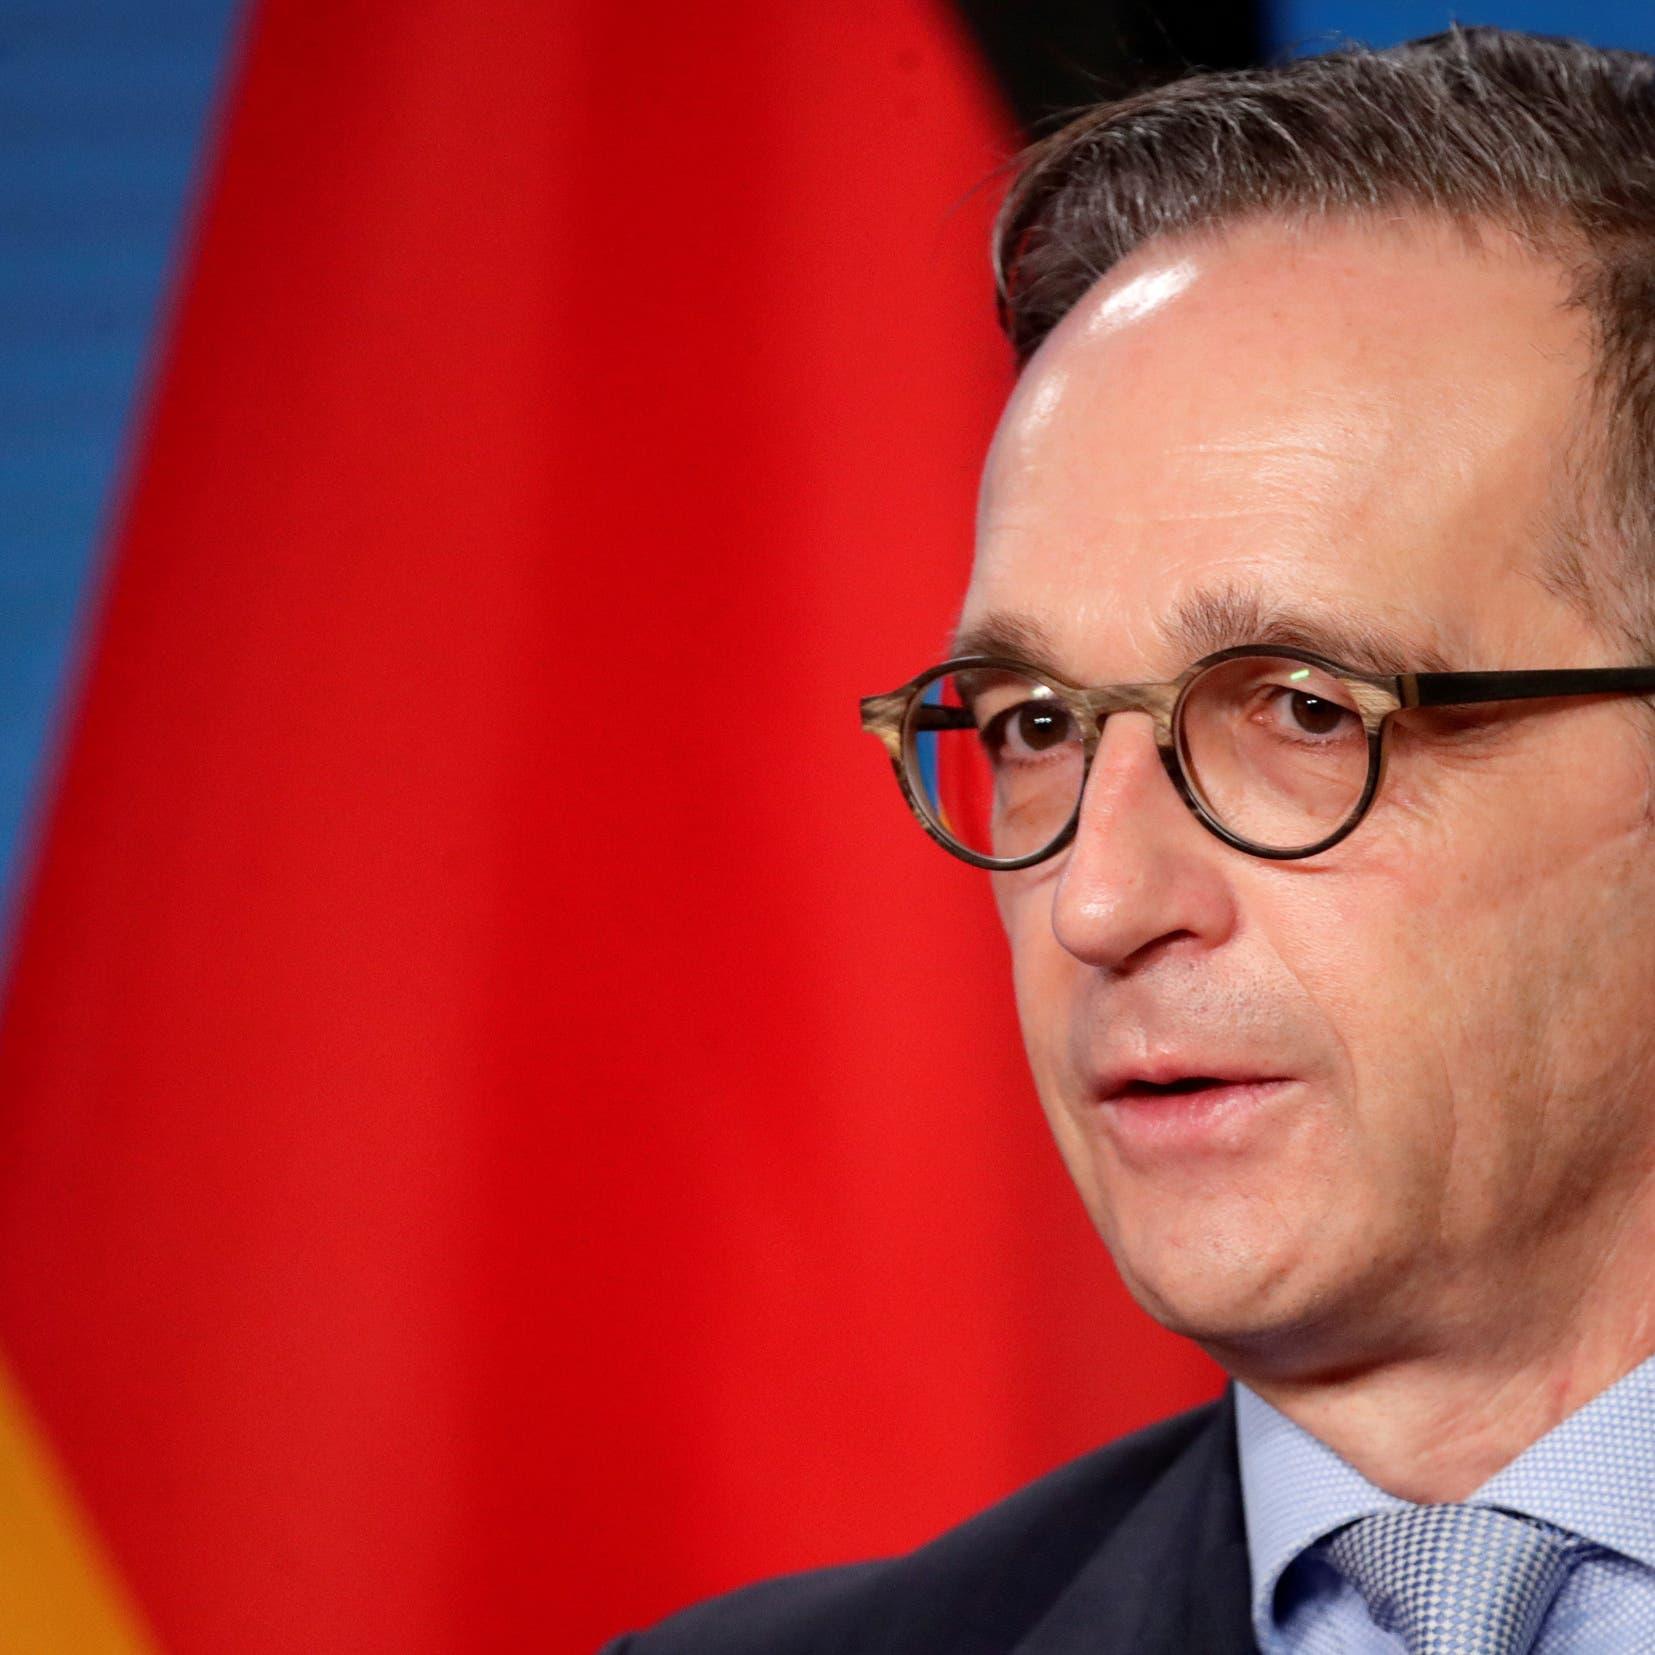 ألمانيا تدعو إلى اتفاق نووي موسع مع إيران